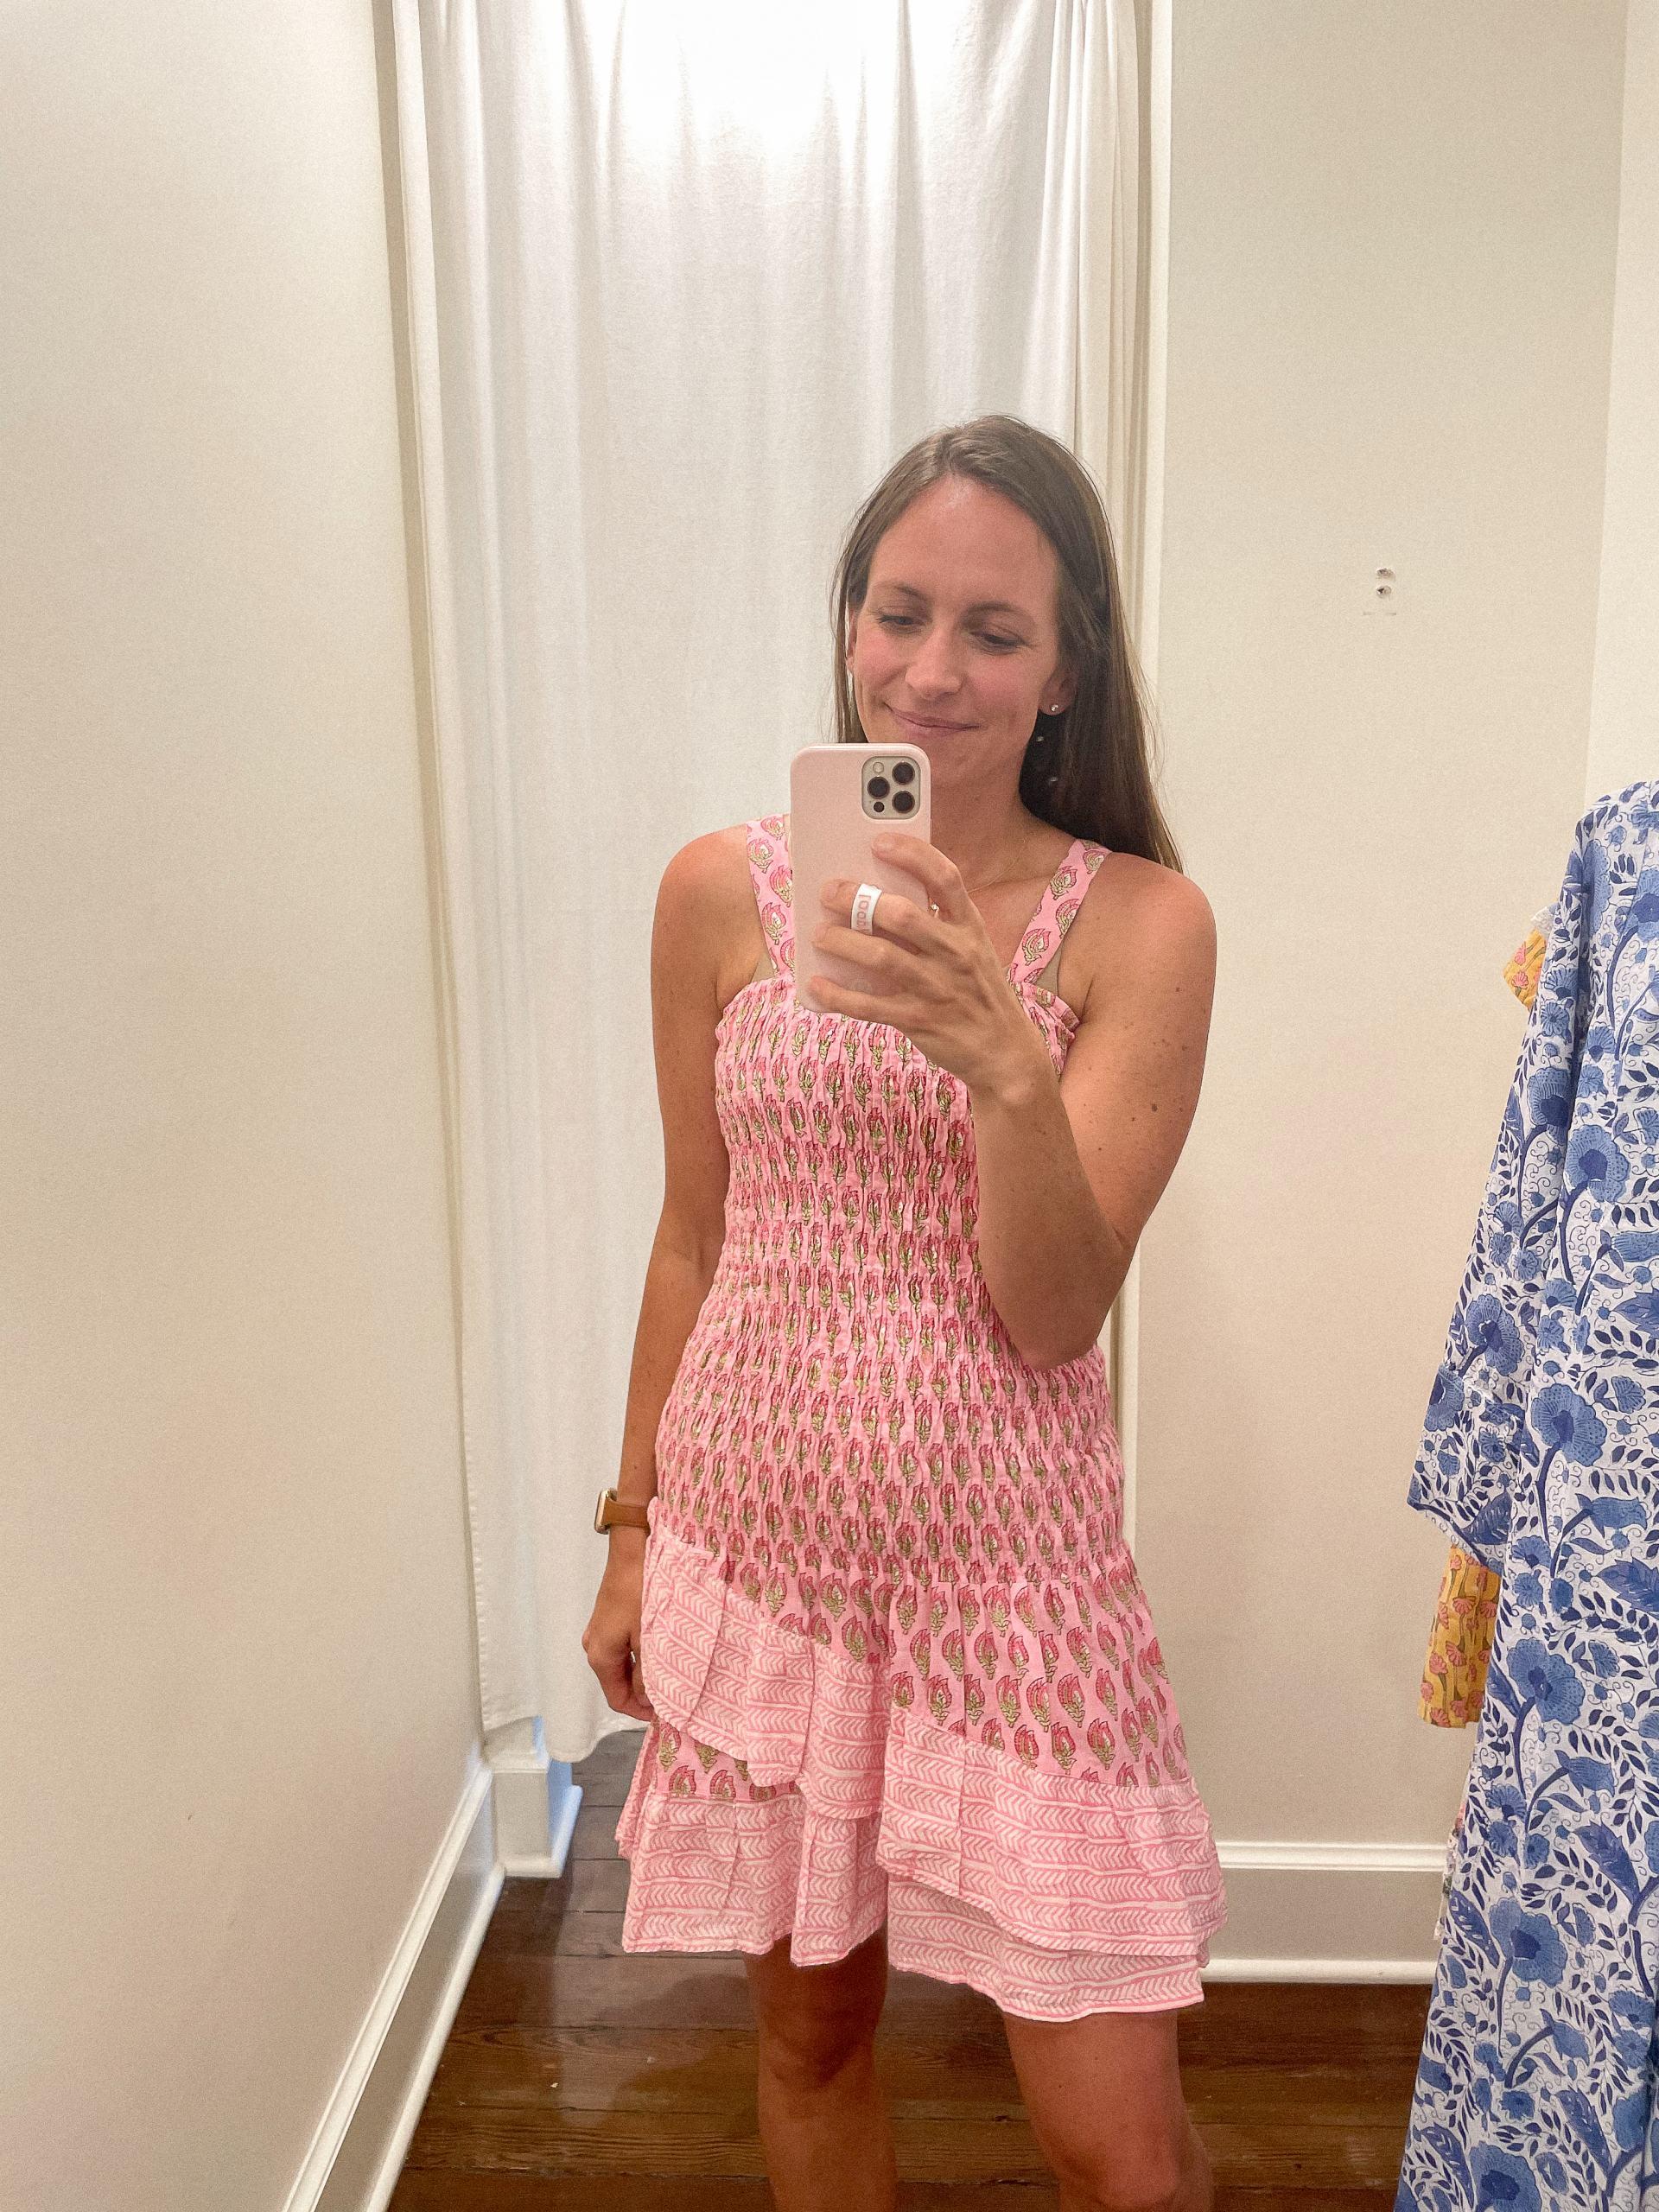 Mathews Dress - Madison Mathews - Madison Mathews discount code - madison mathews sizing - block print dress